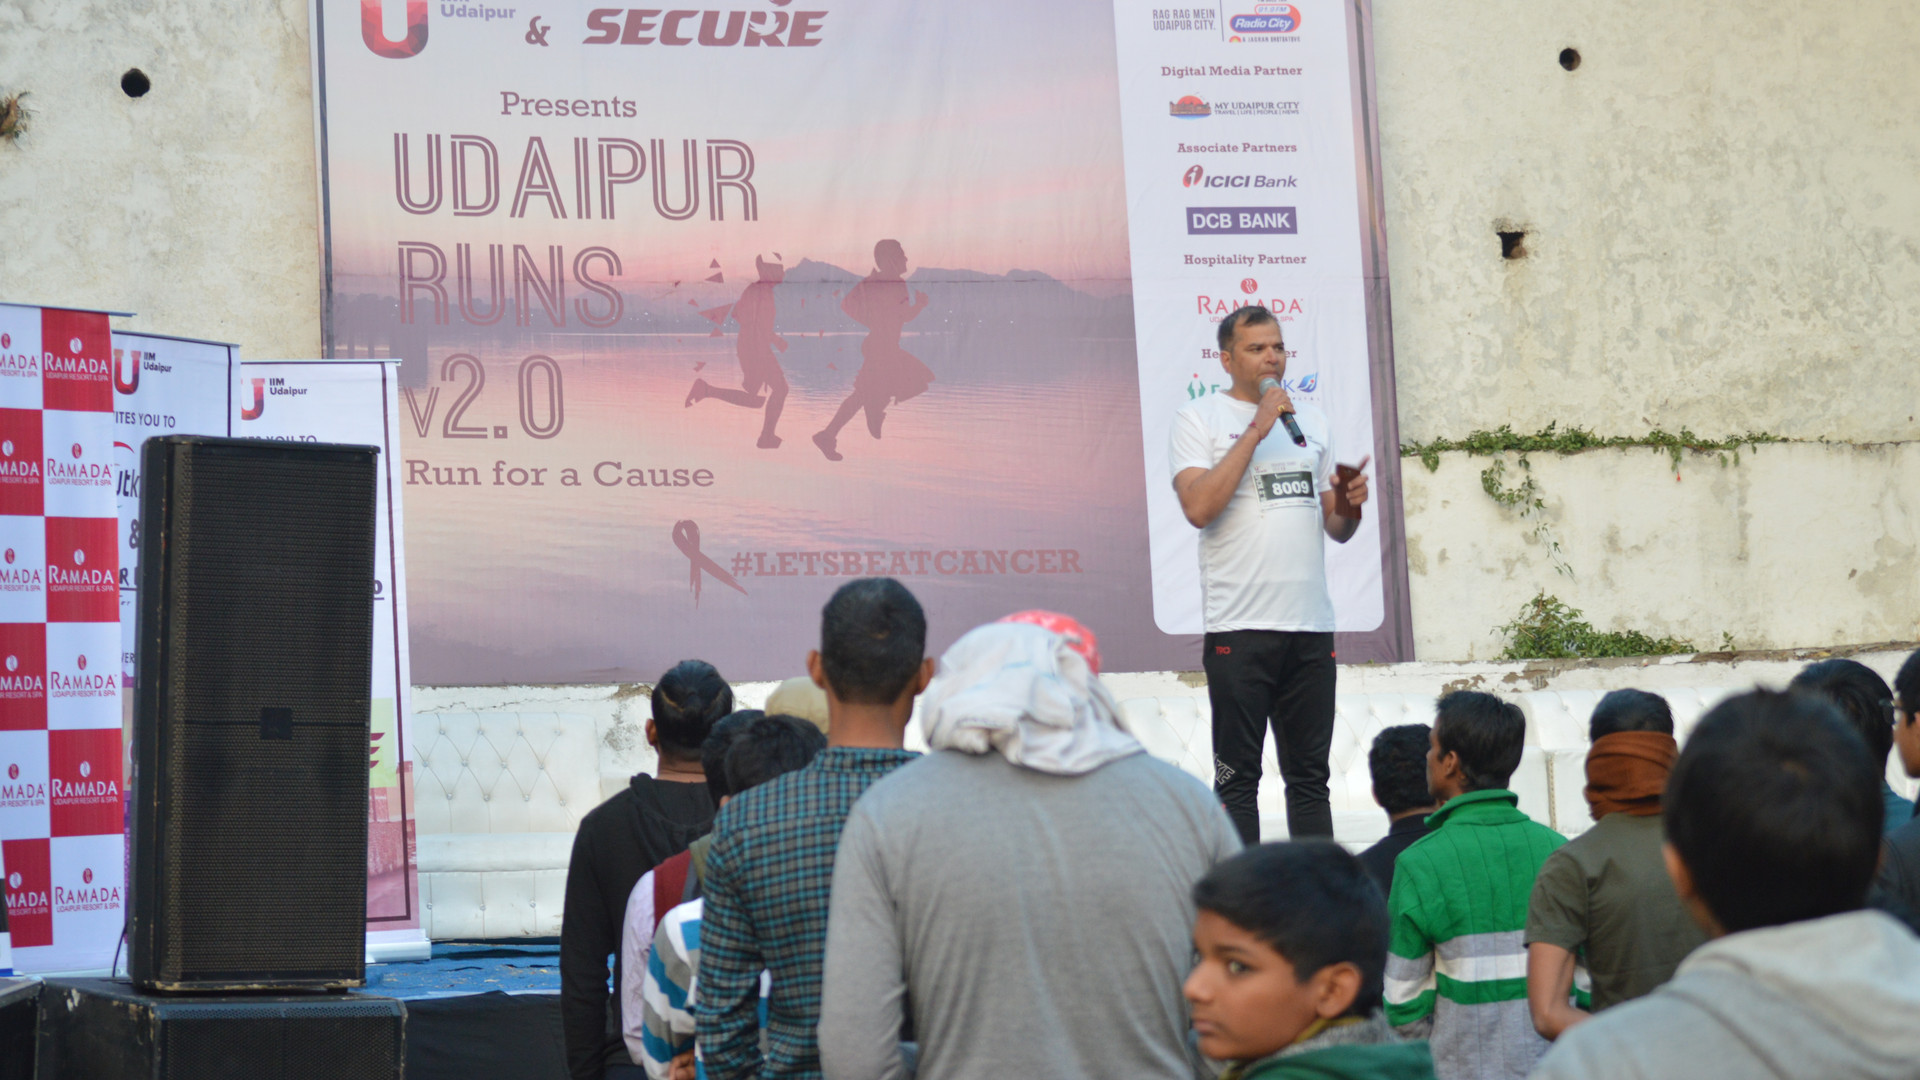 UdaipurRuns_TitleSponsor_Securemeters